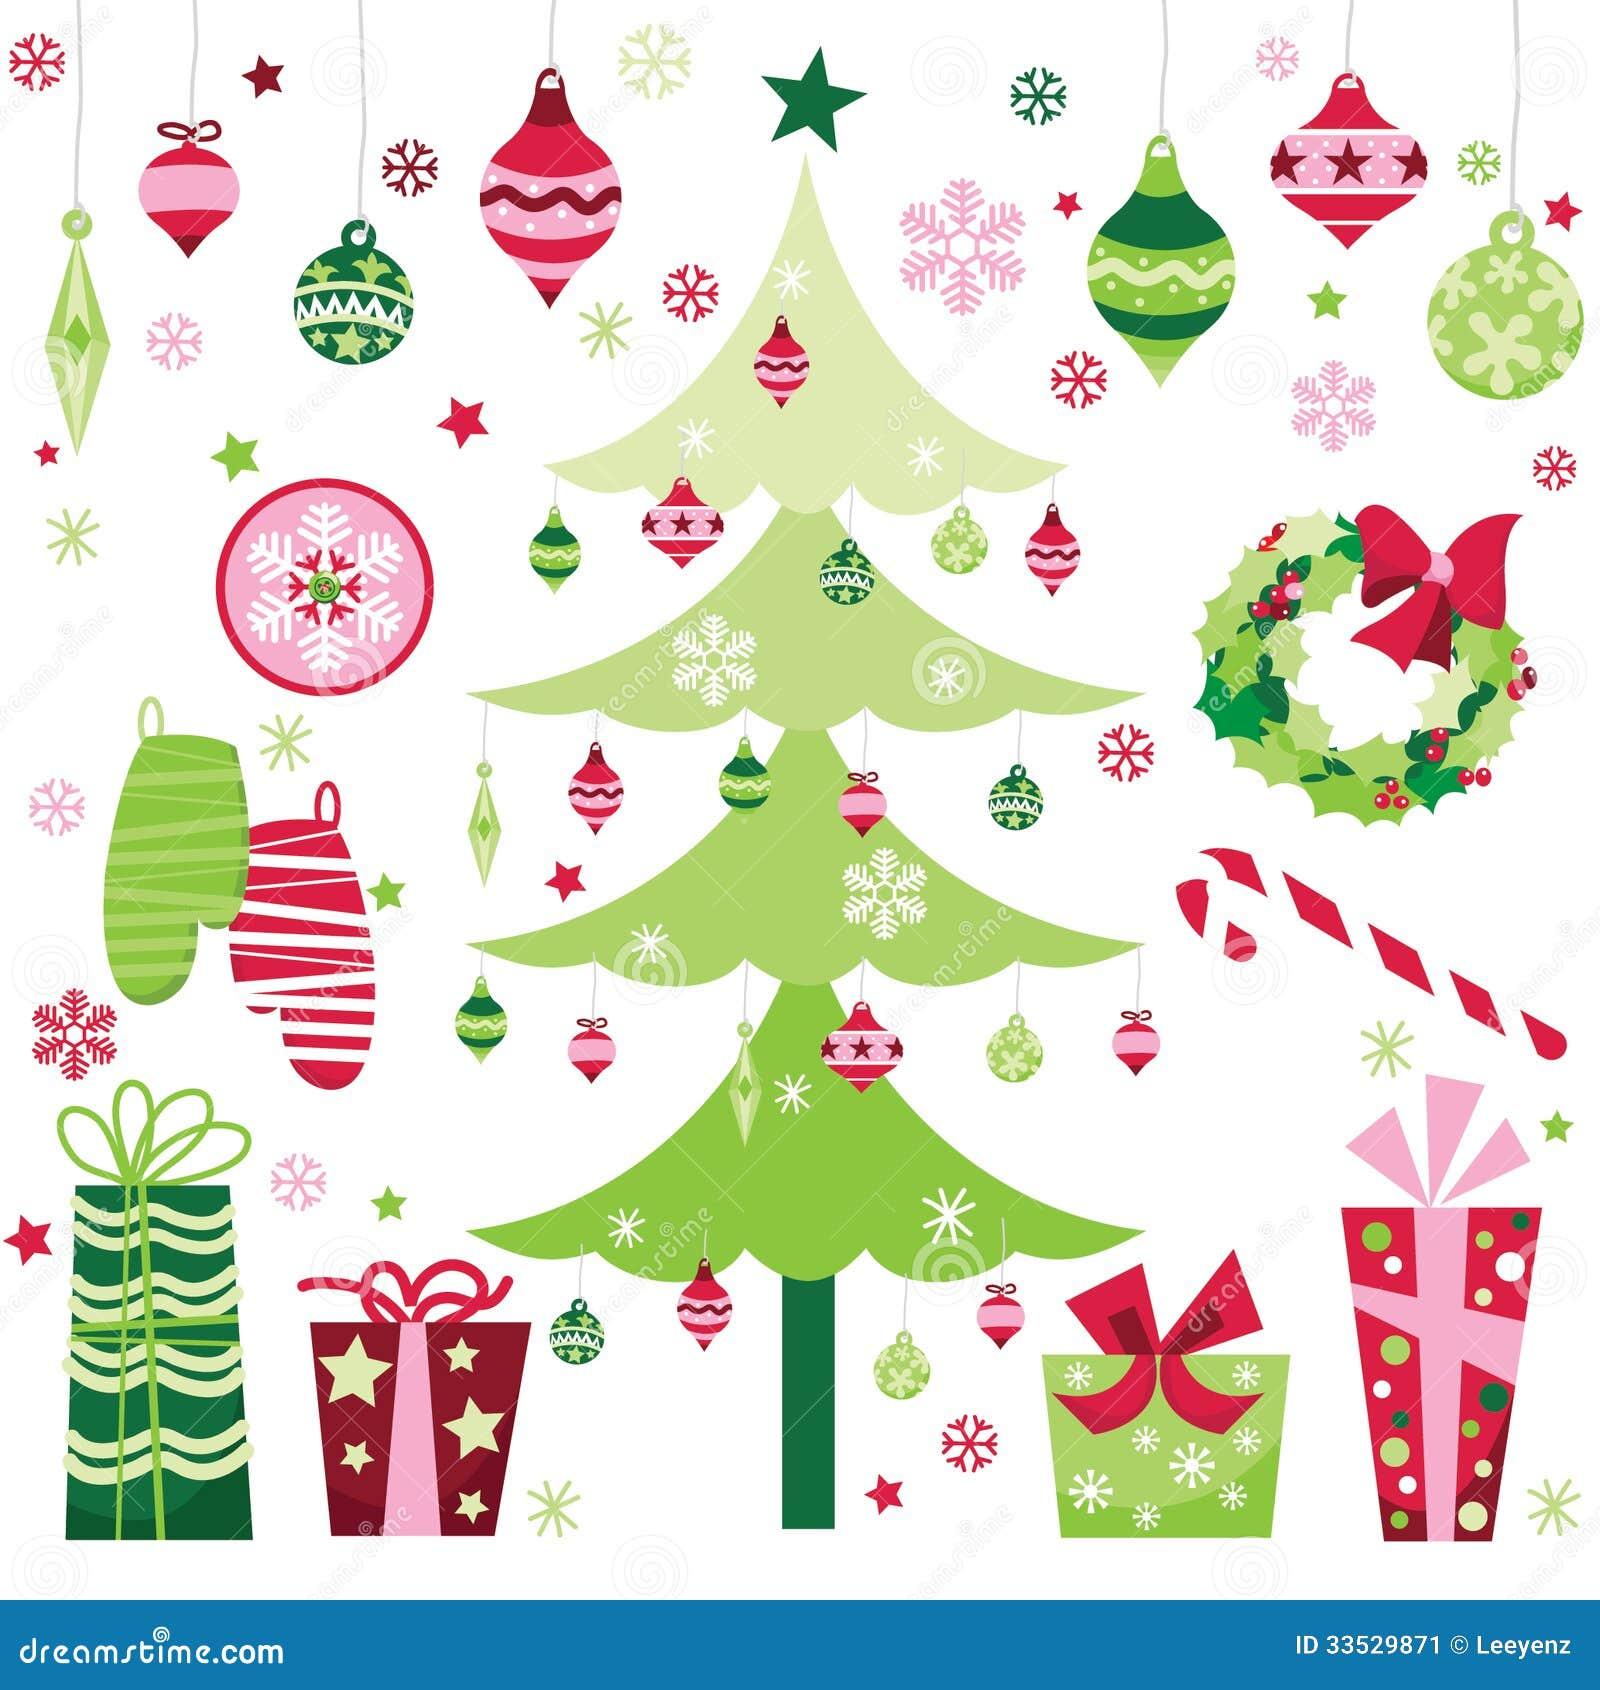 christmas clip art santa and tree